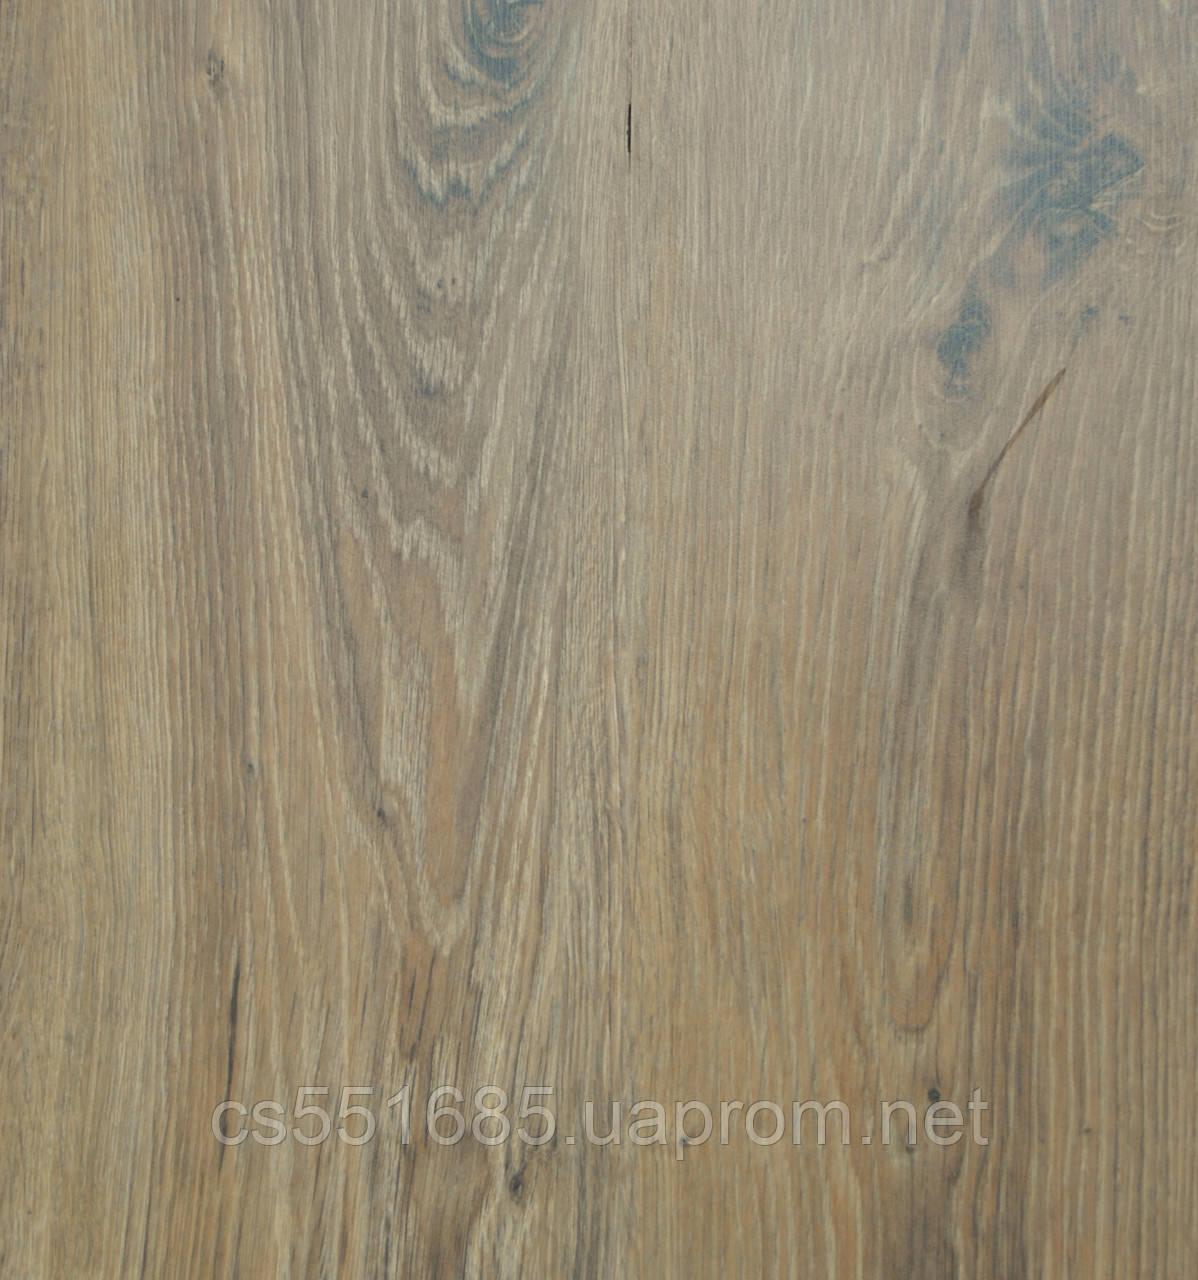 8669 - Дуб Силезия. Ламинат Tower Floor (Товер Флор) Exclusive HighGloss